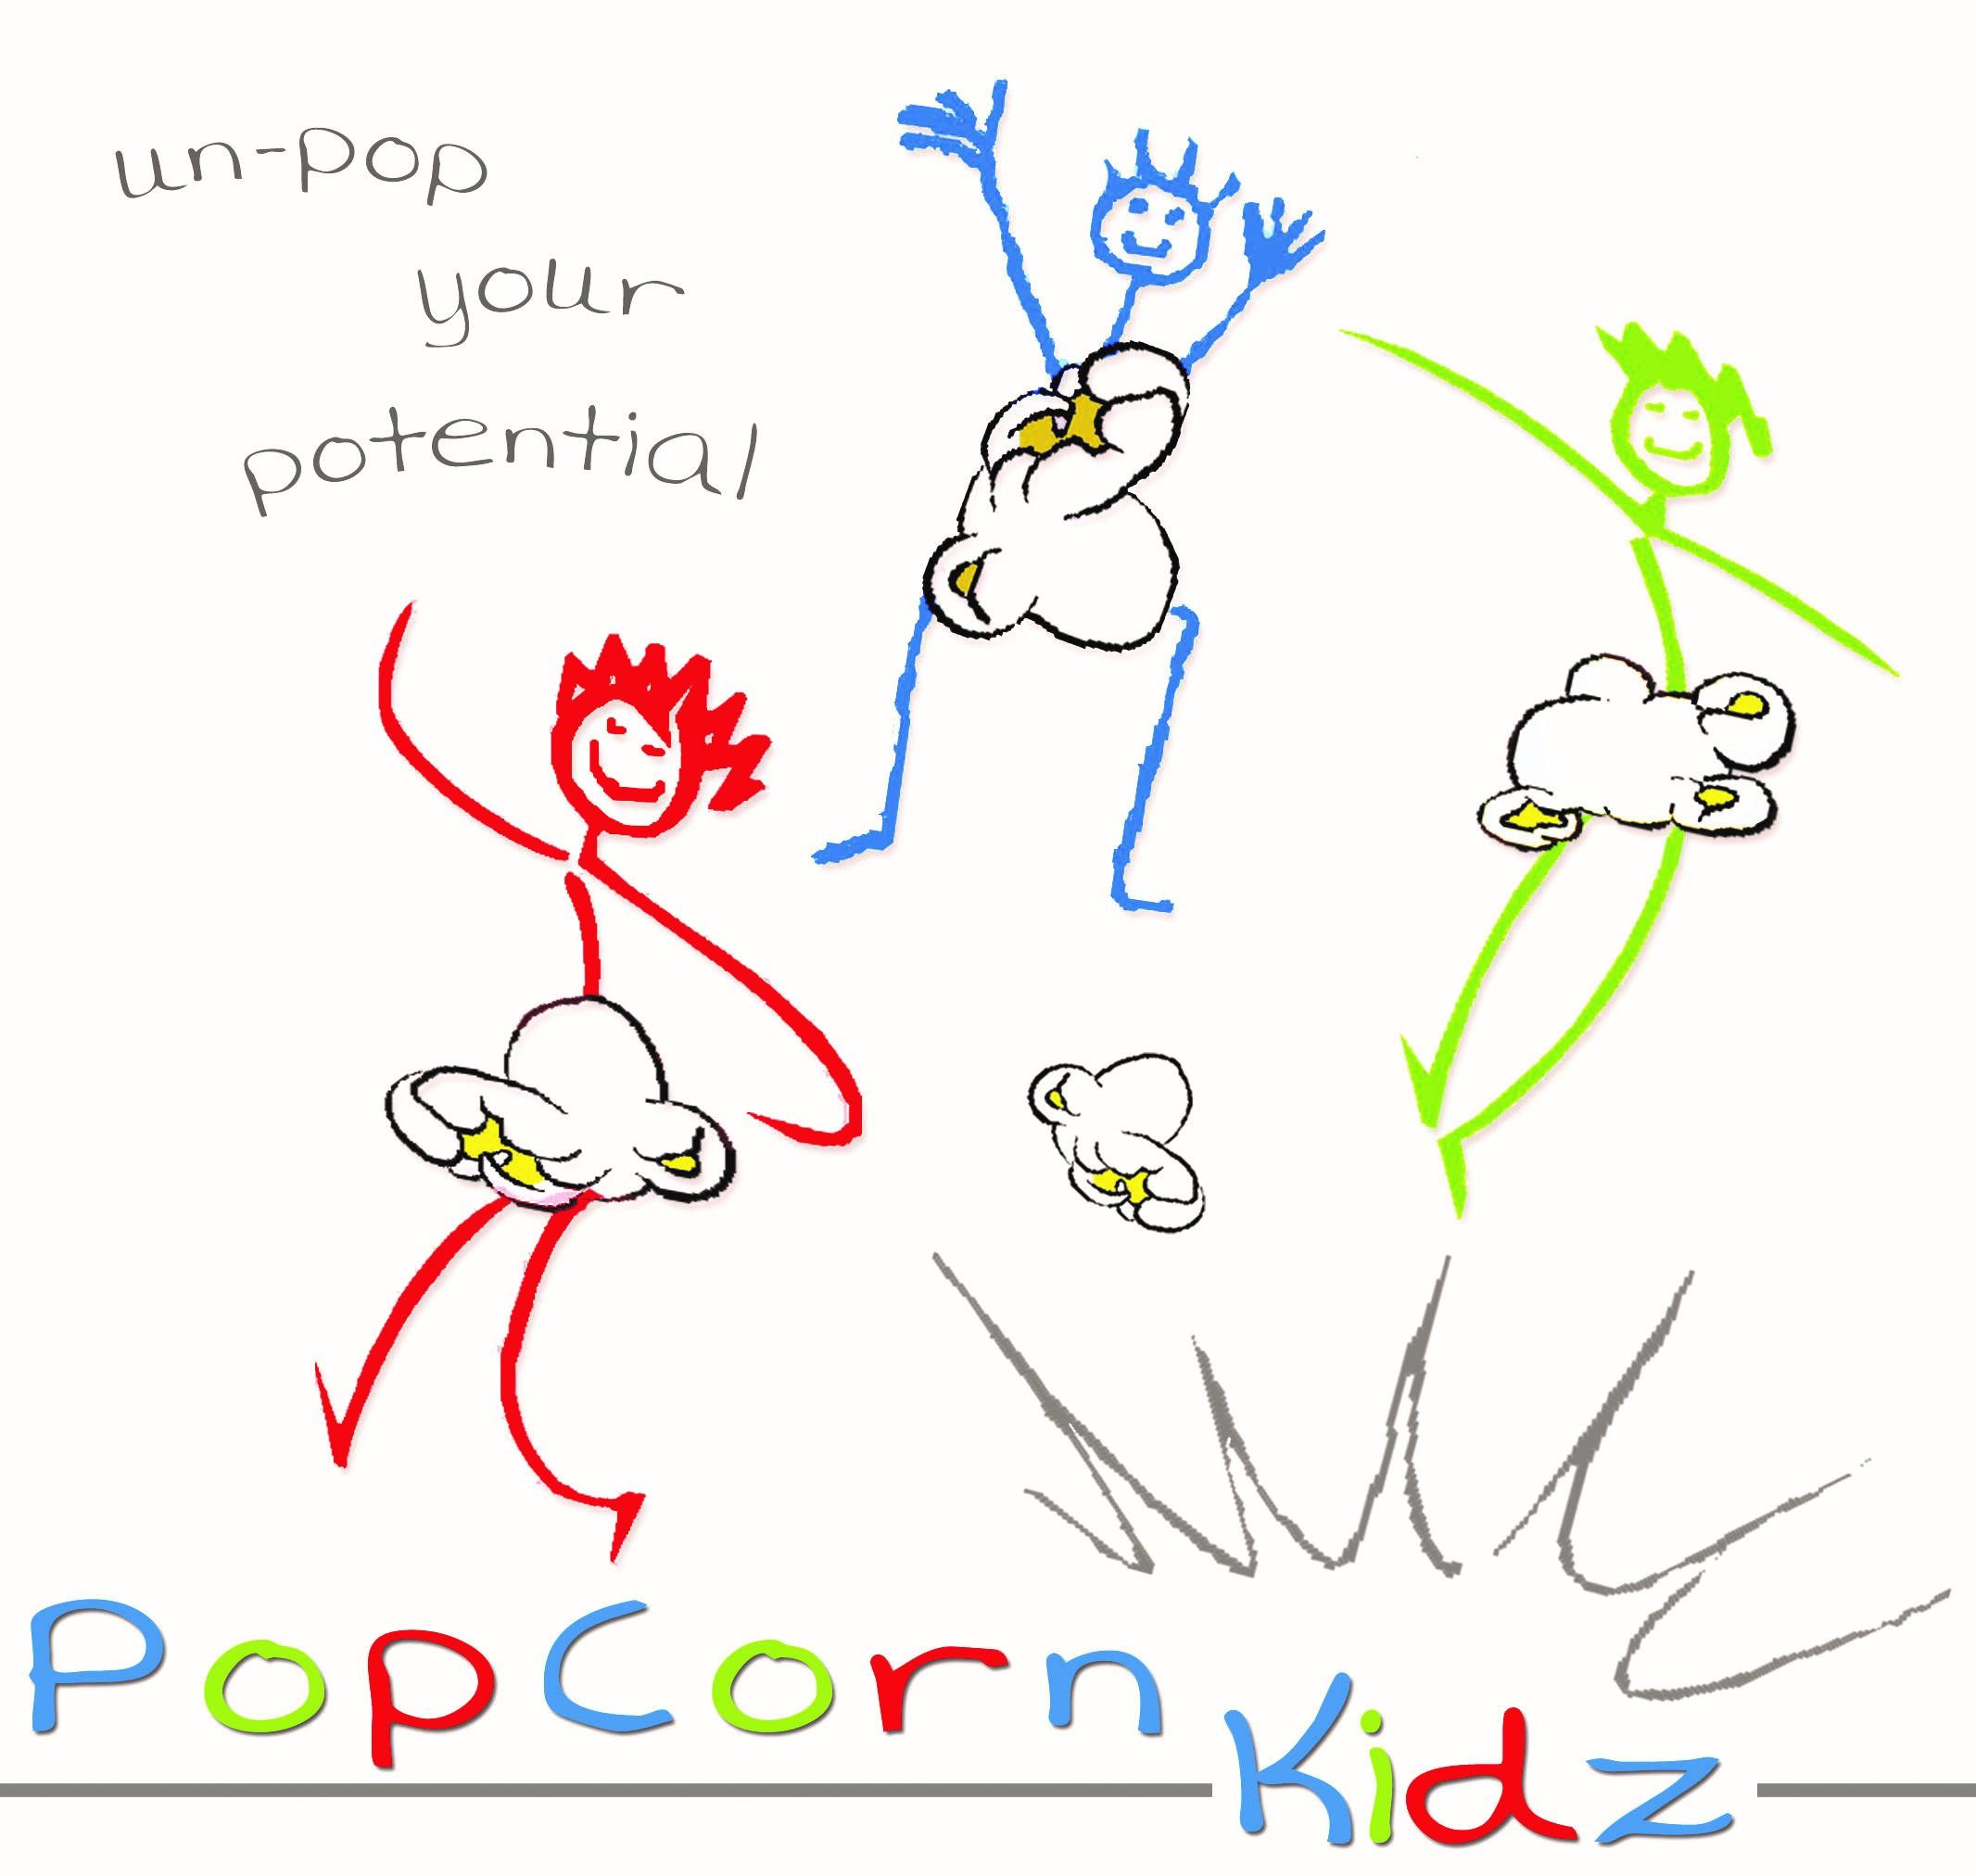 Popcorn Kidz NPC